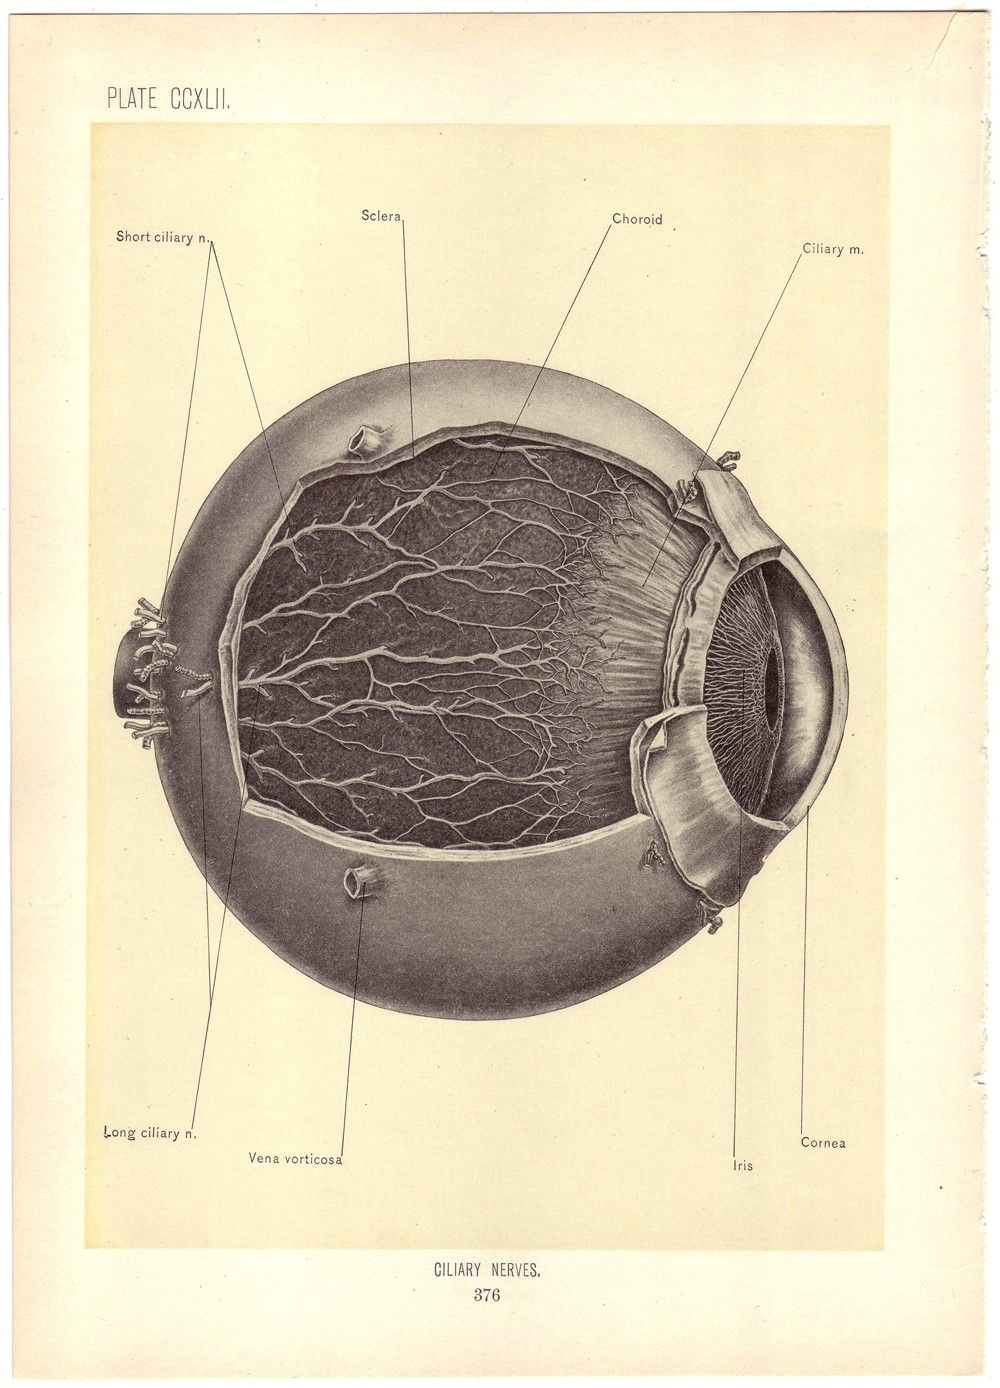 medical art medical drawings medical history vintage medical